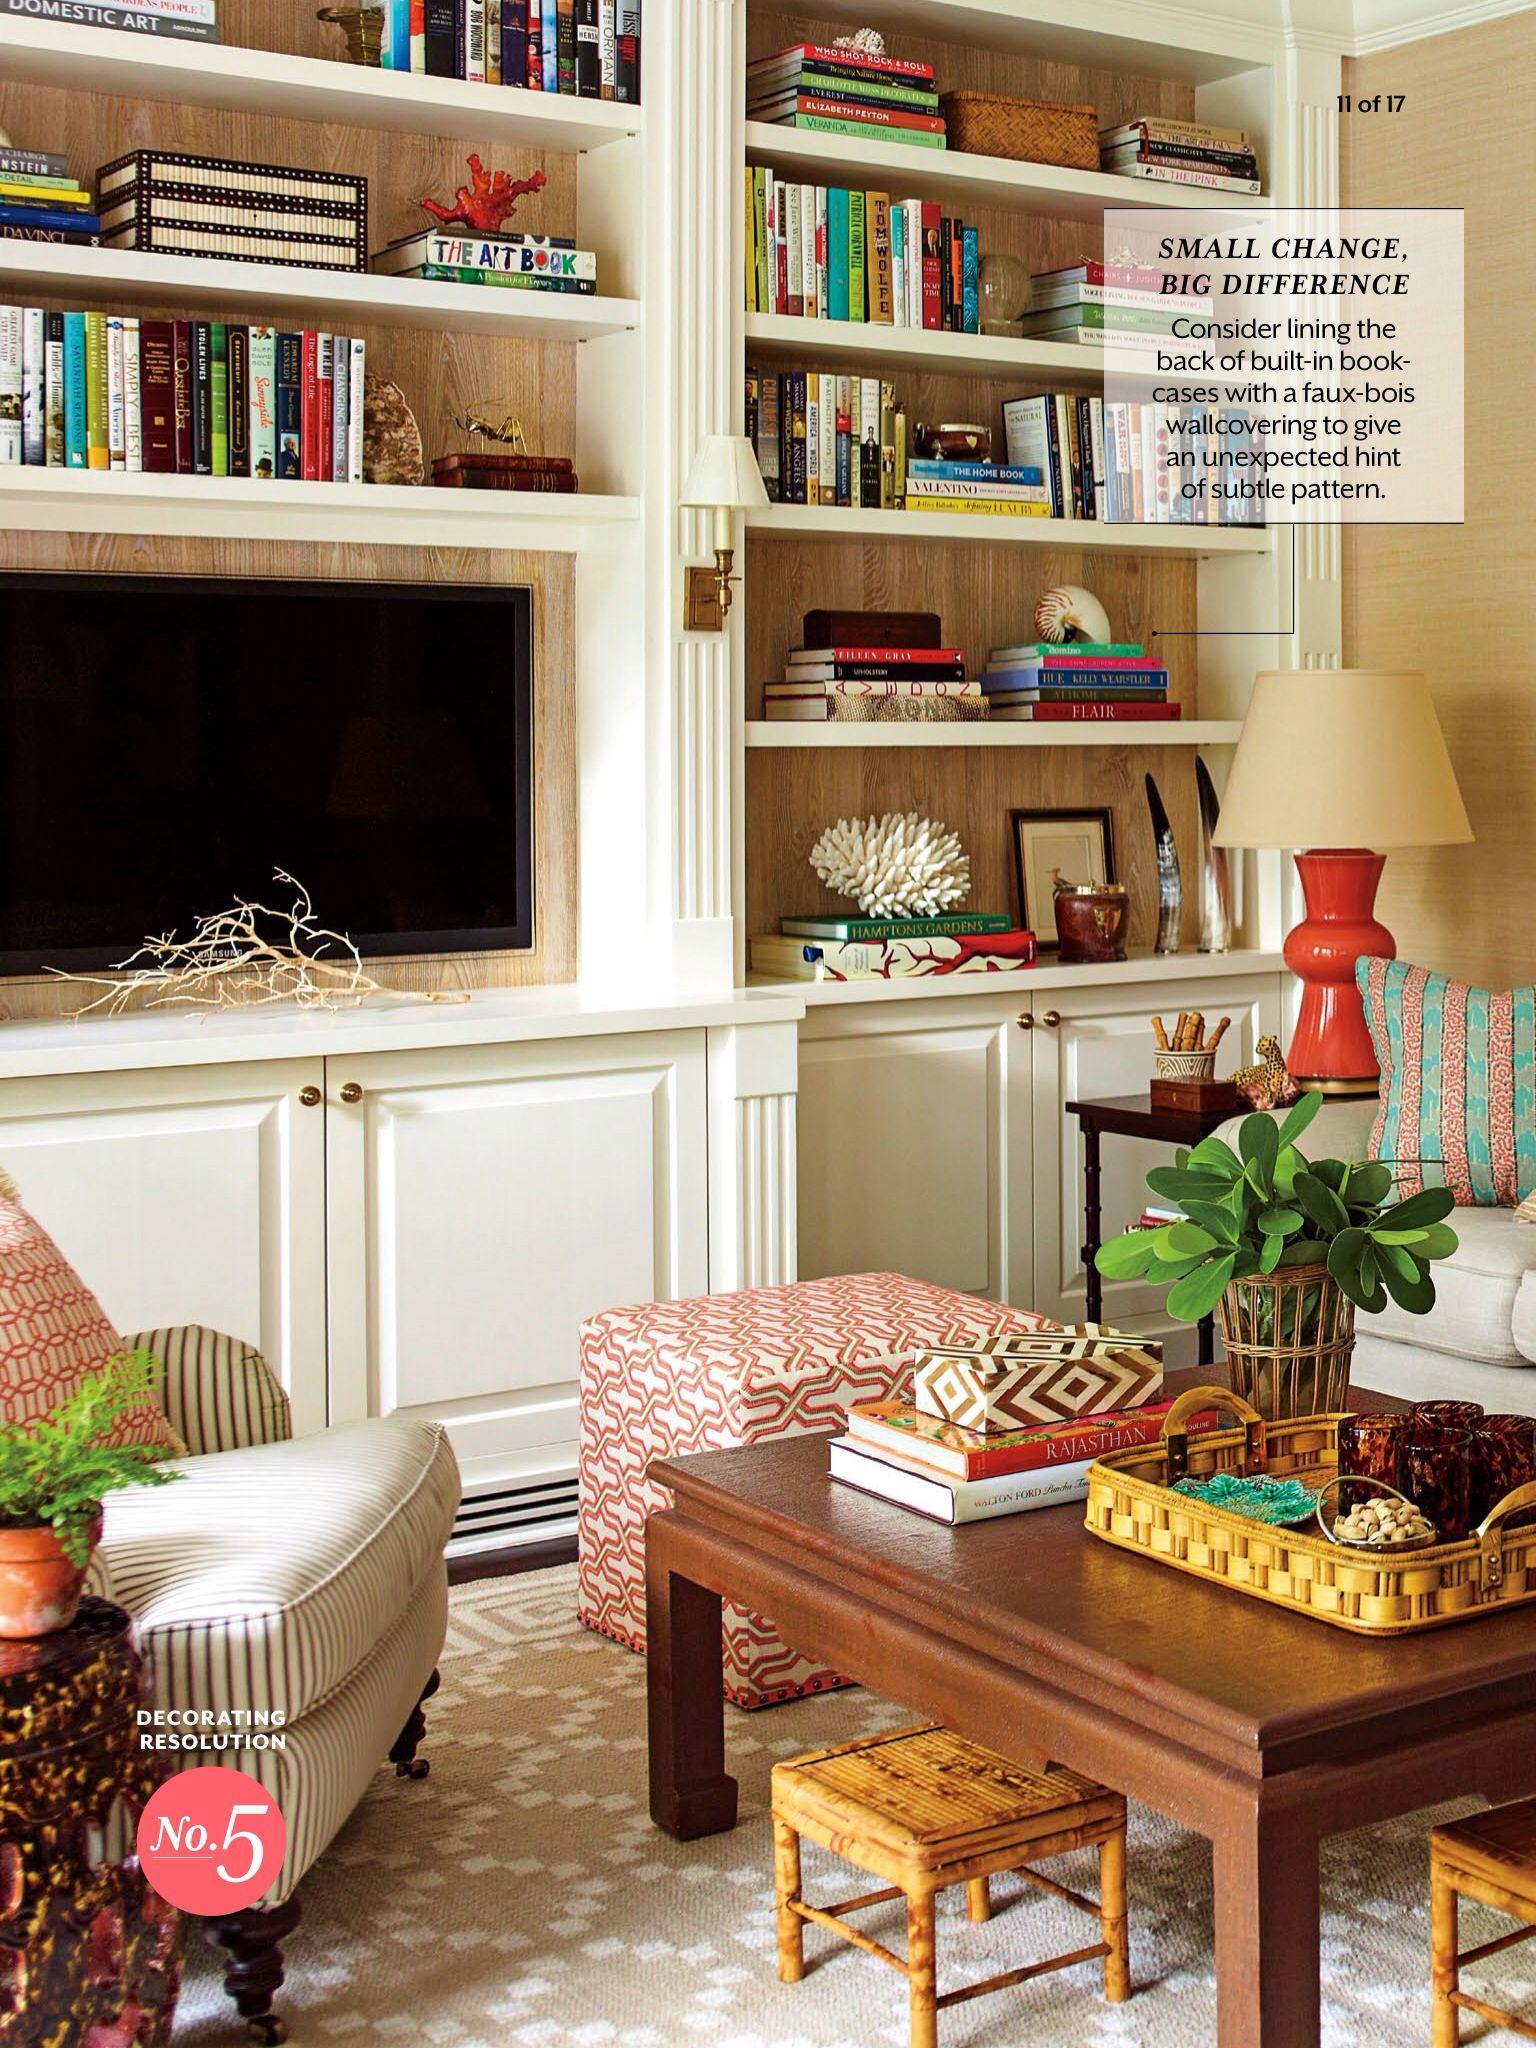 Southern home decor catalog trend home design and decor